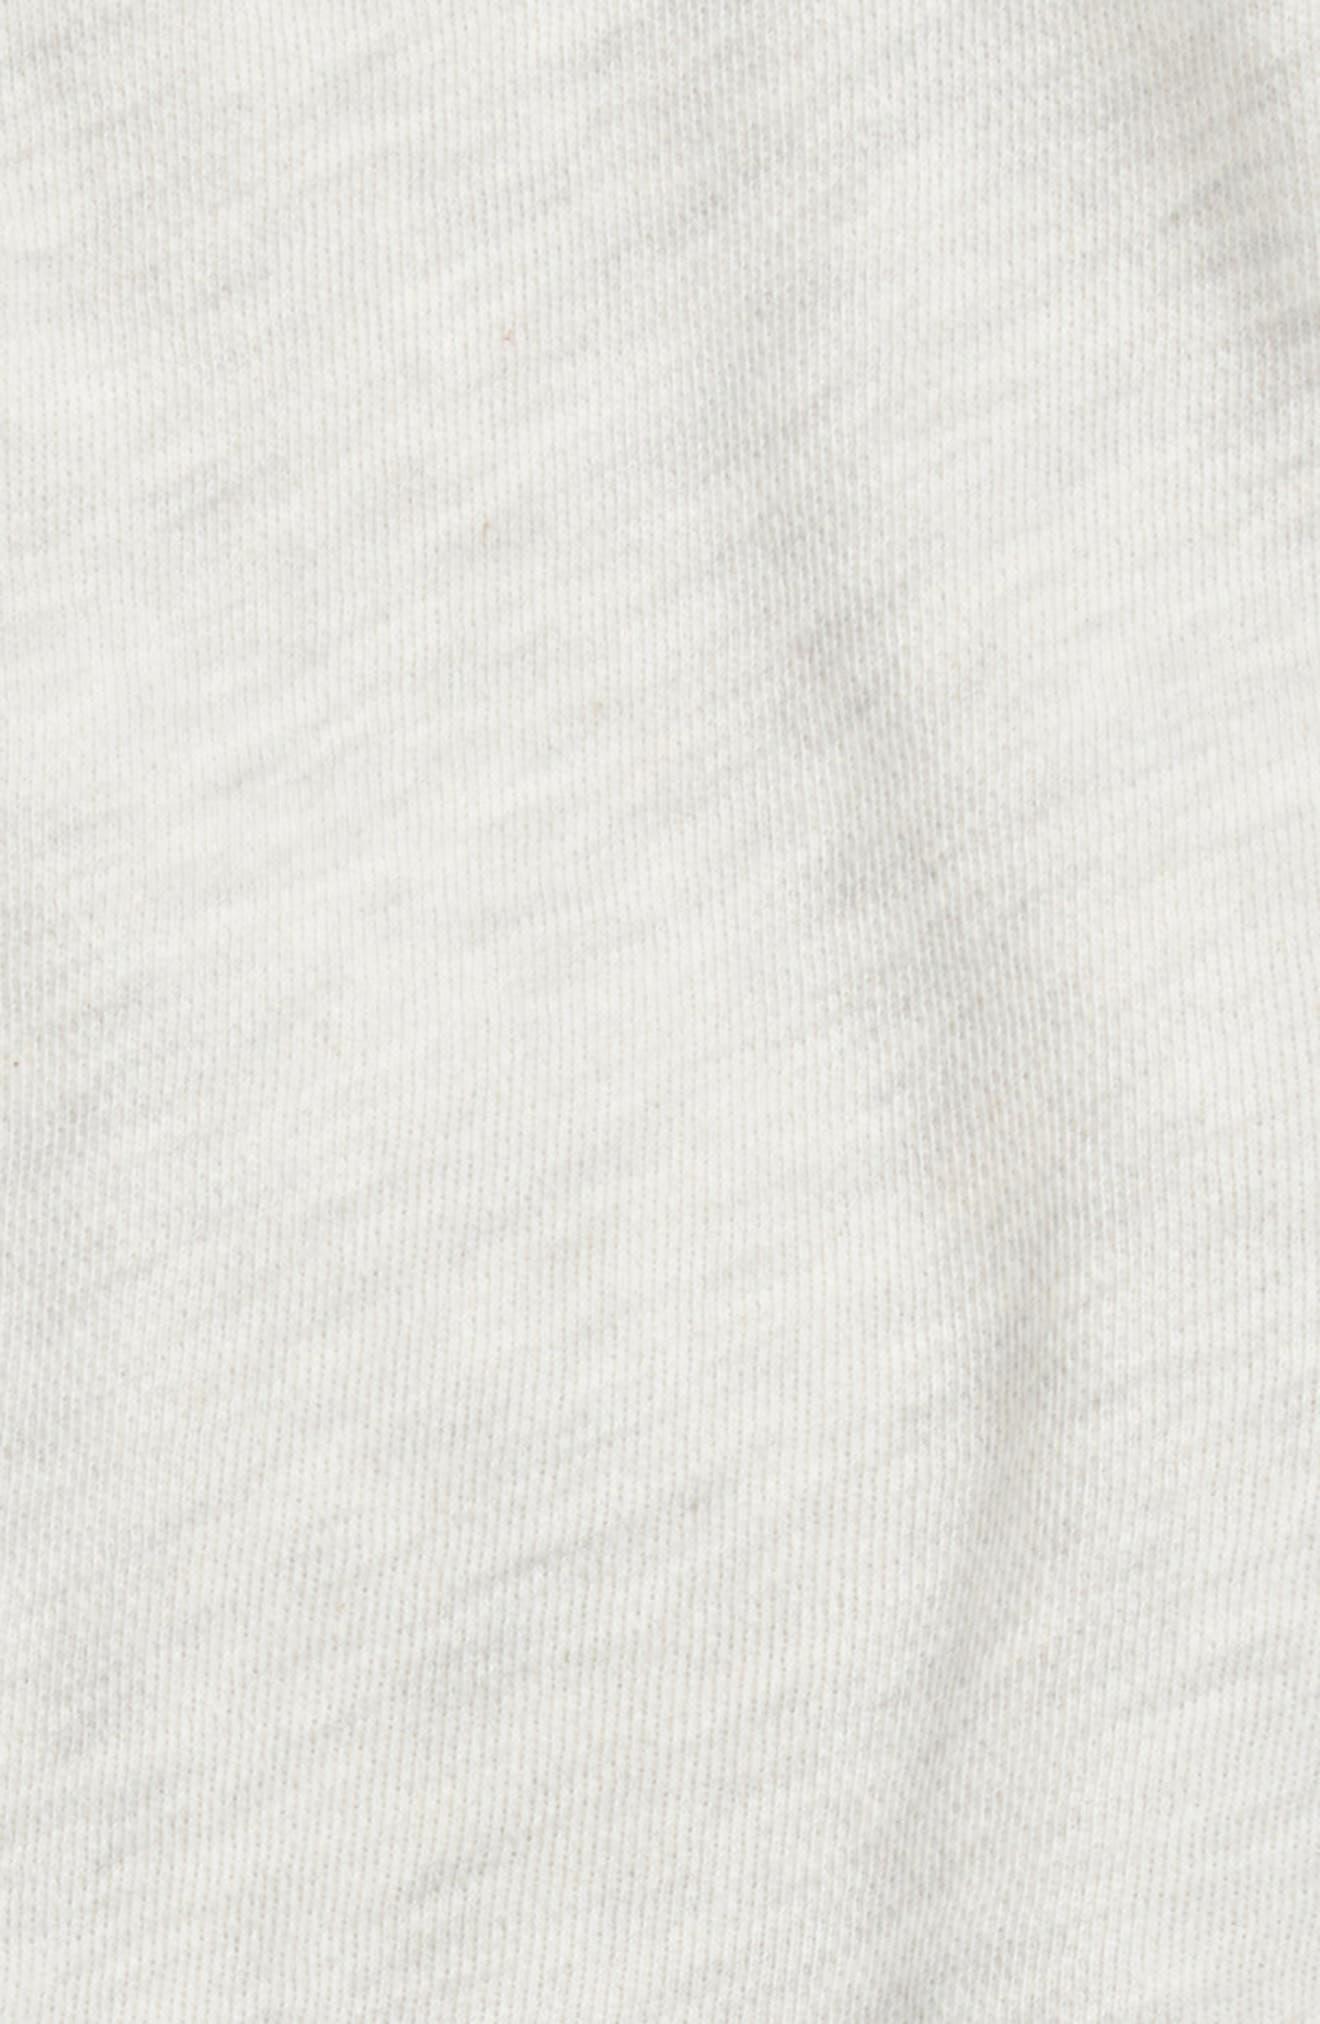 Hoodie & Pants Set,                             Main thumbnail 1, color,                             900